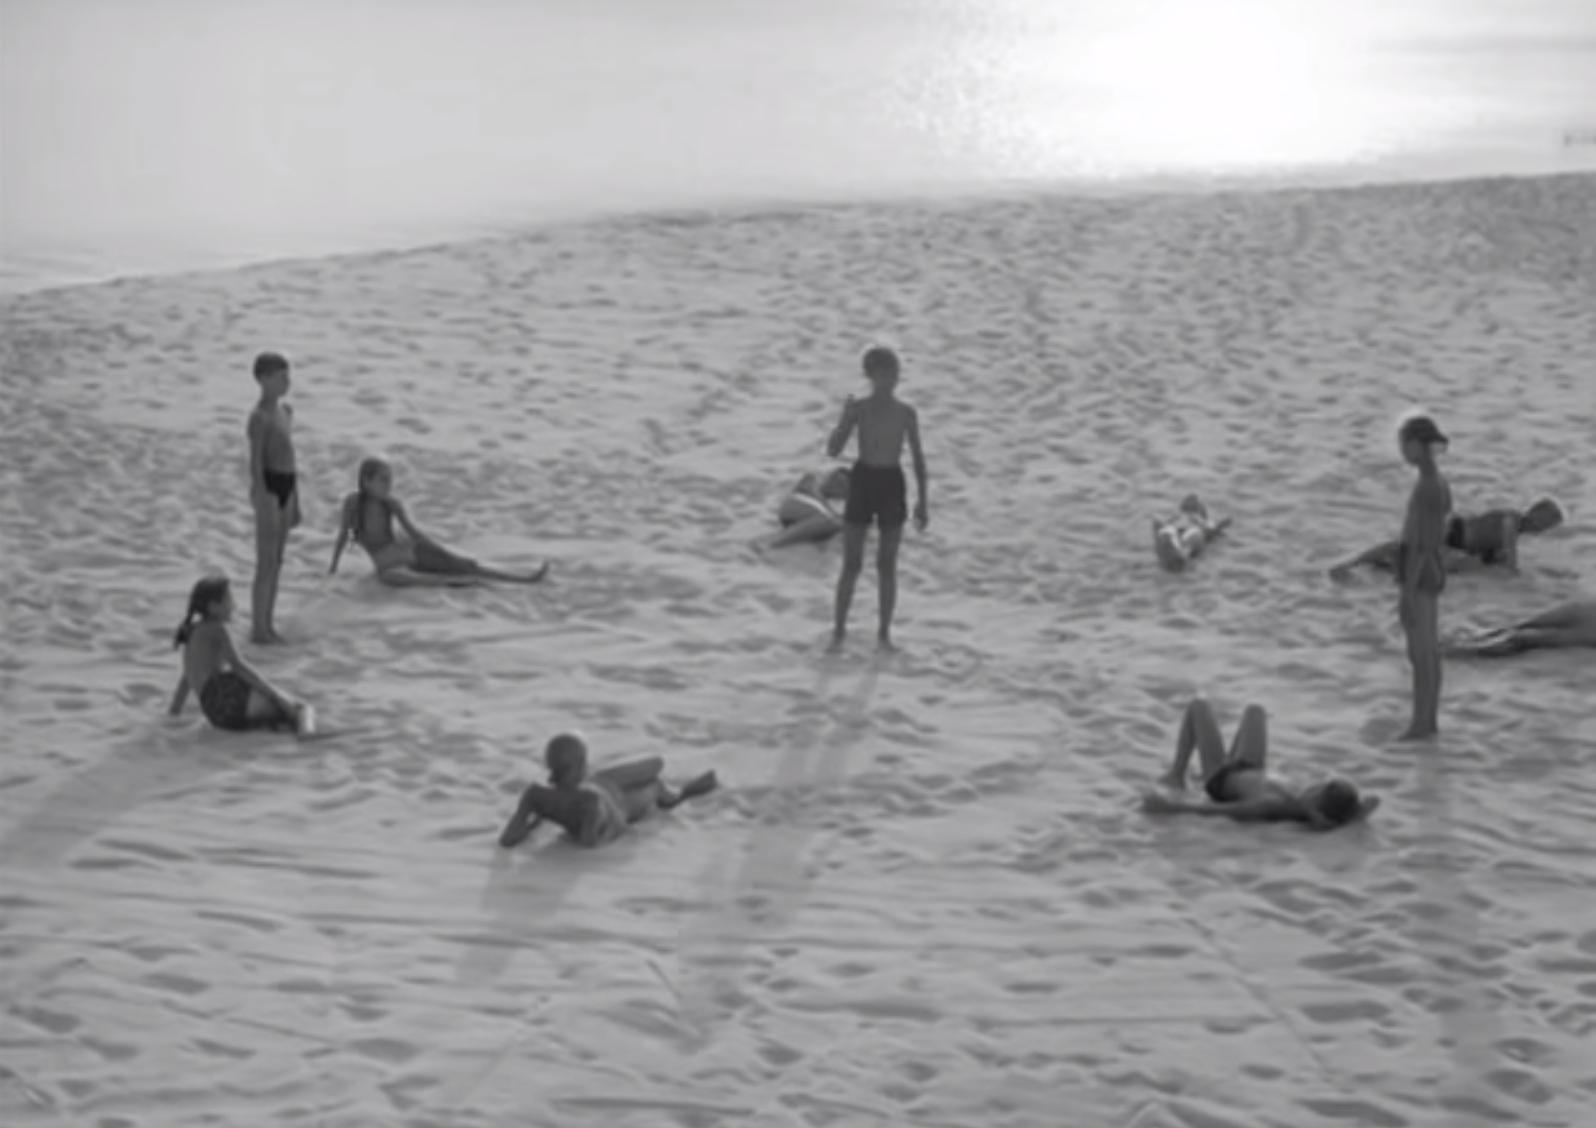 Ivan's Childhood (Andrei Tarkovsky, 1962)